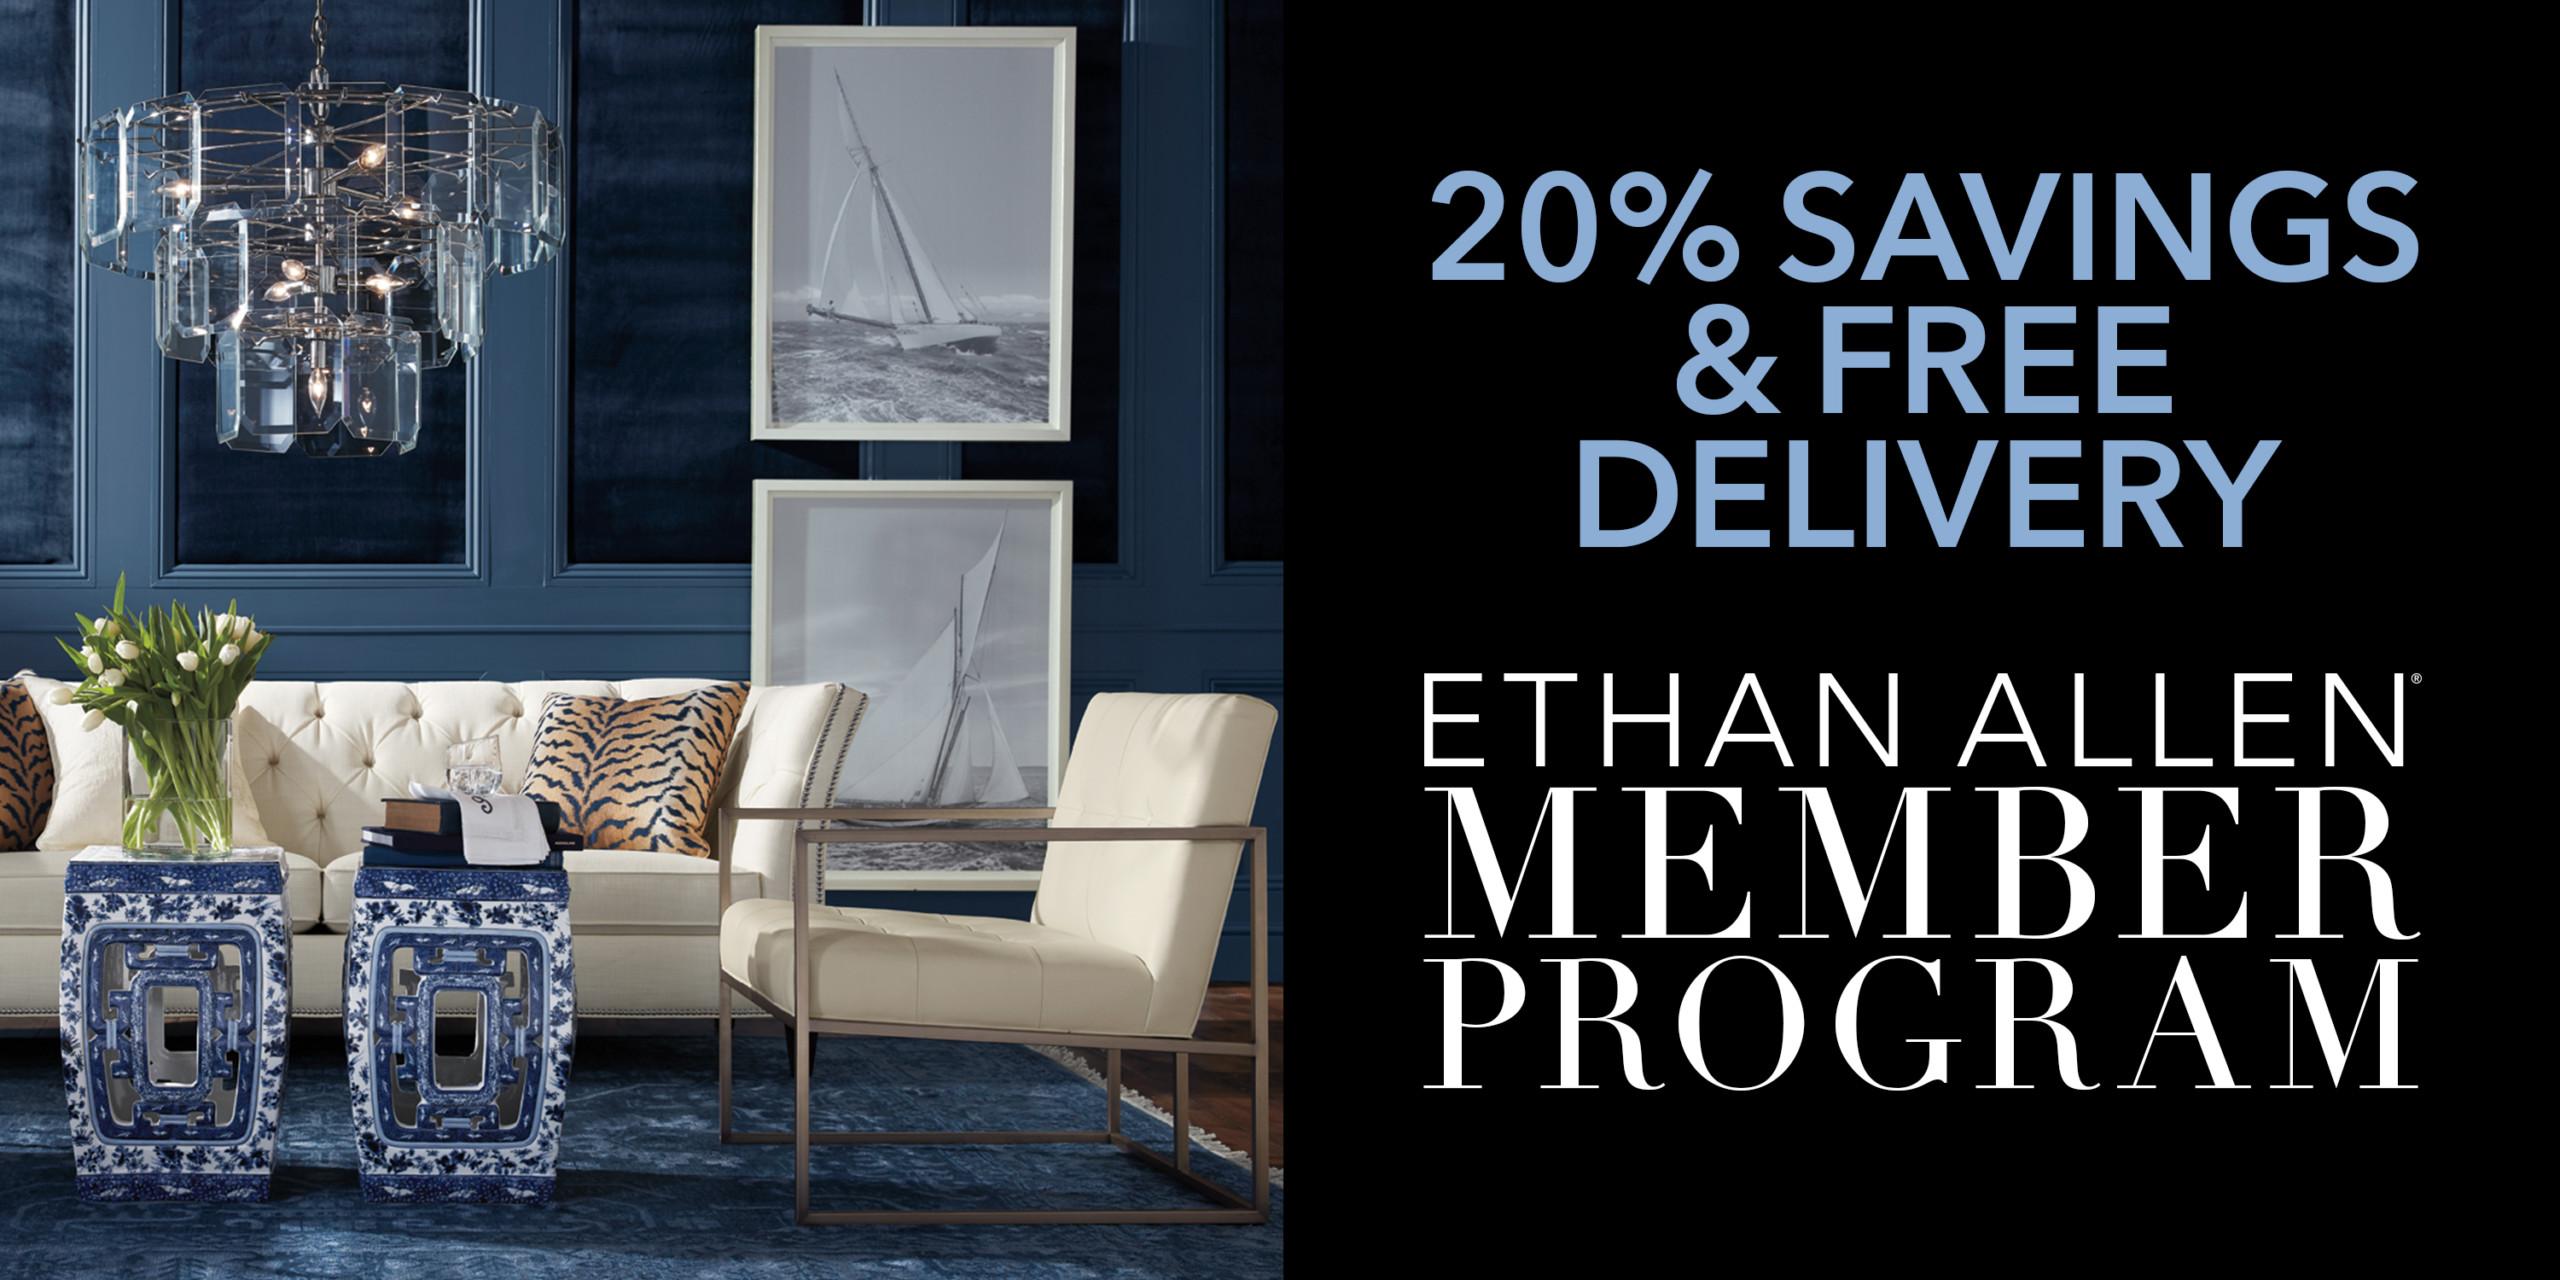 Member Savings & Free Delivery!